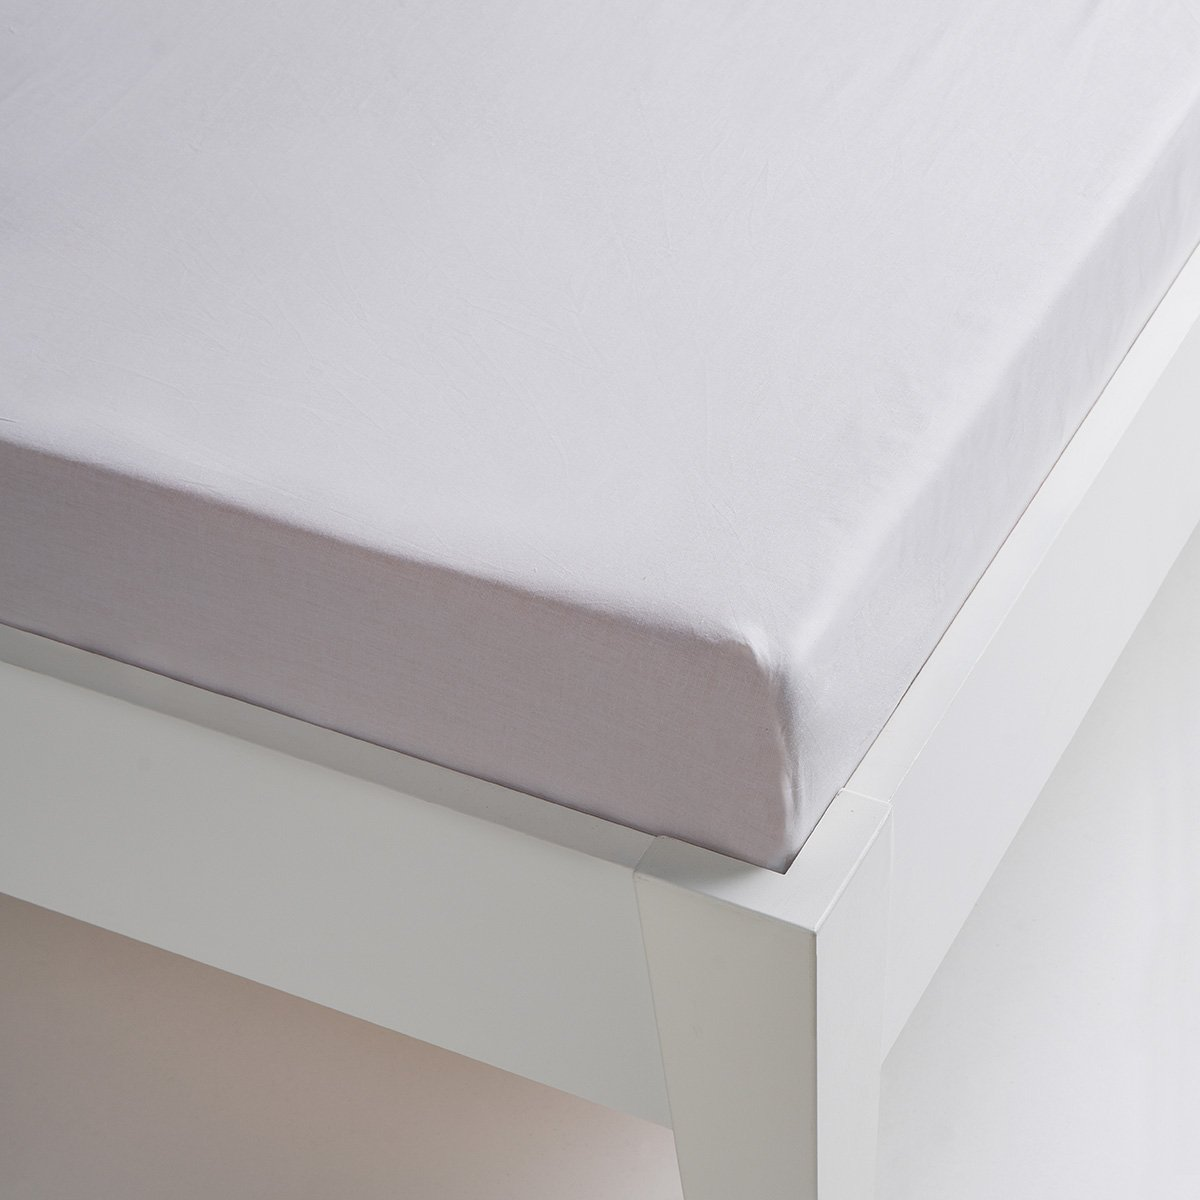 Aire Textil Sábanas HOSTELERIA - Bajera Ajustable Calidad 200 Hilos. Percal 100% algodón.